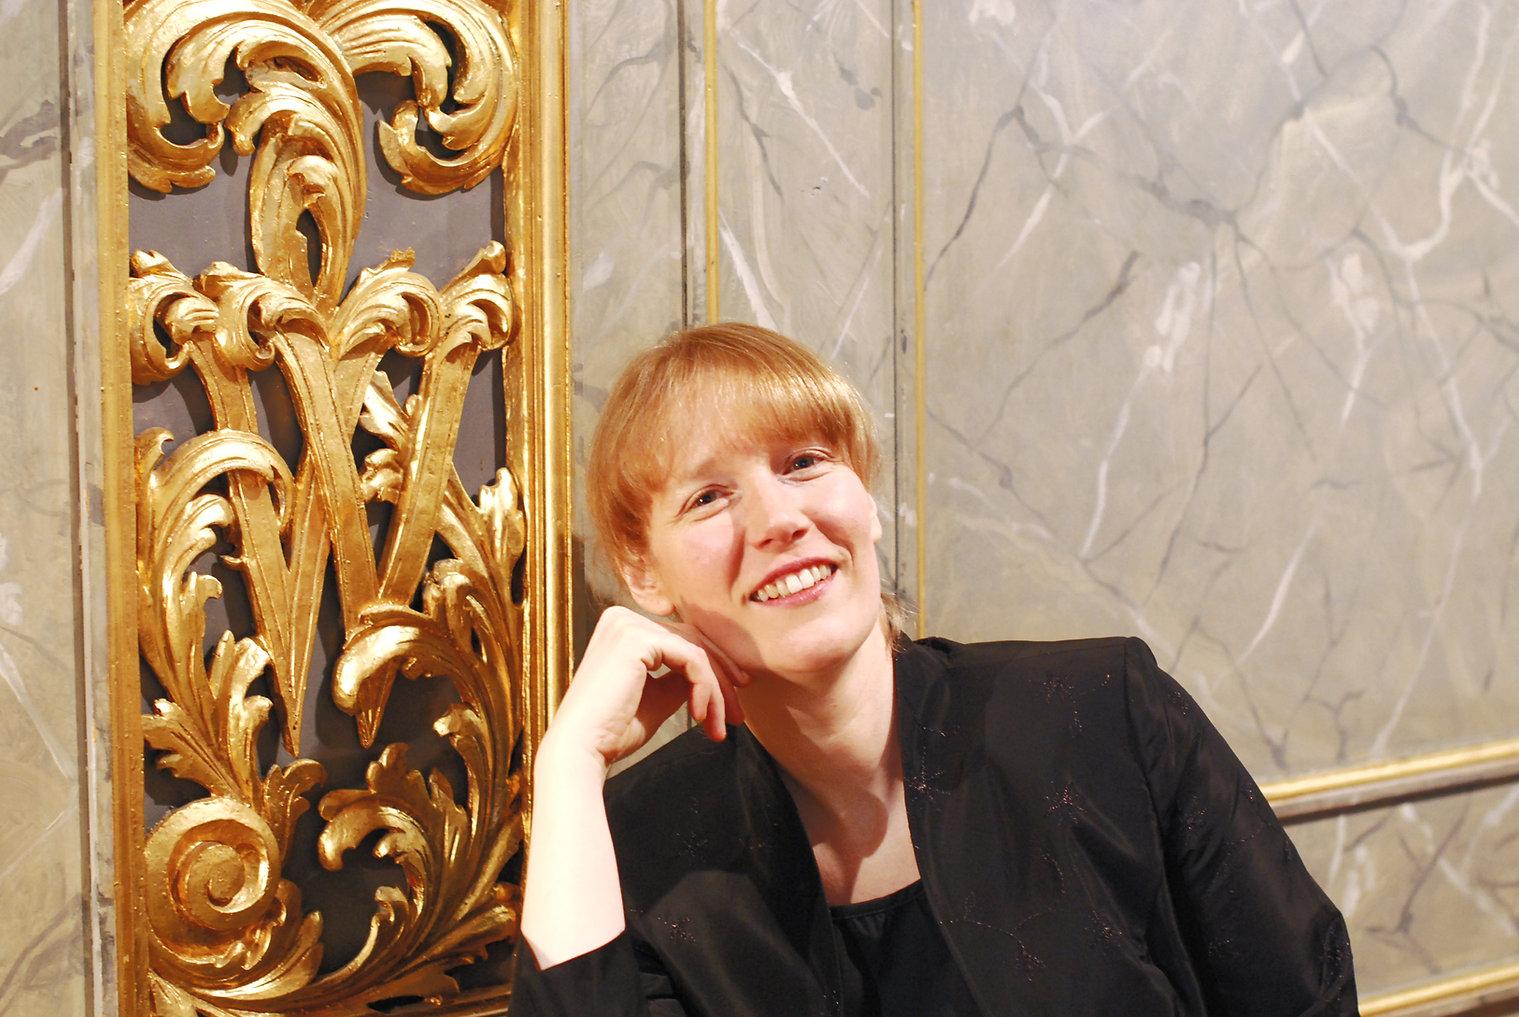 Bettina Wißner